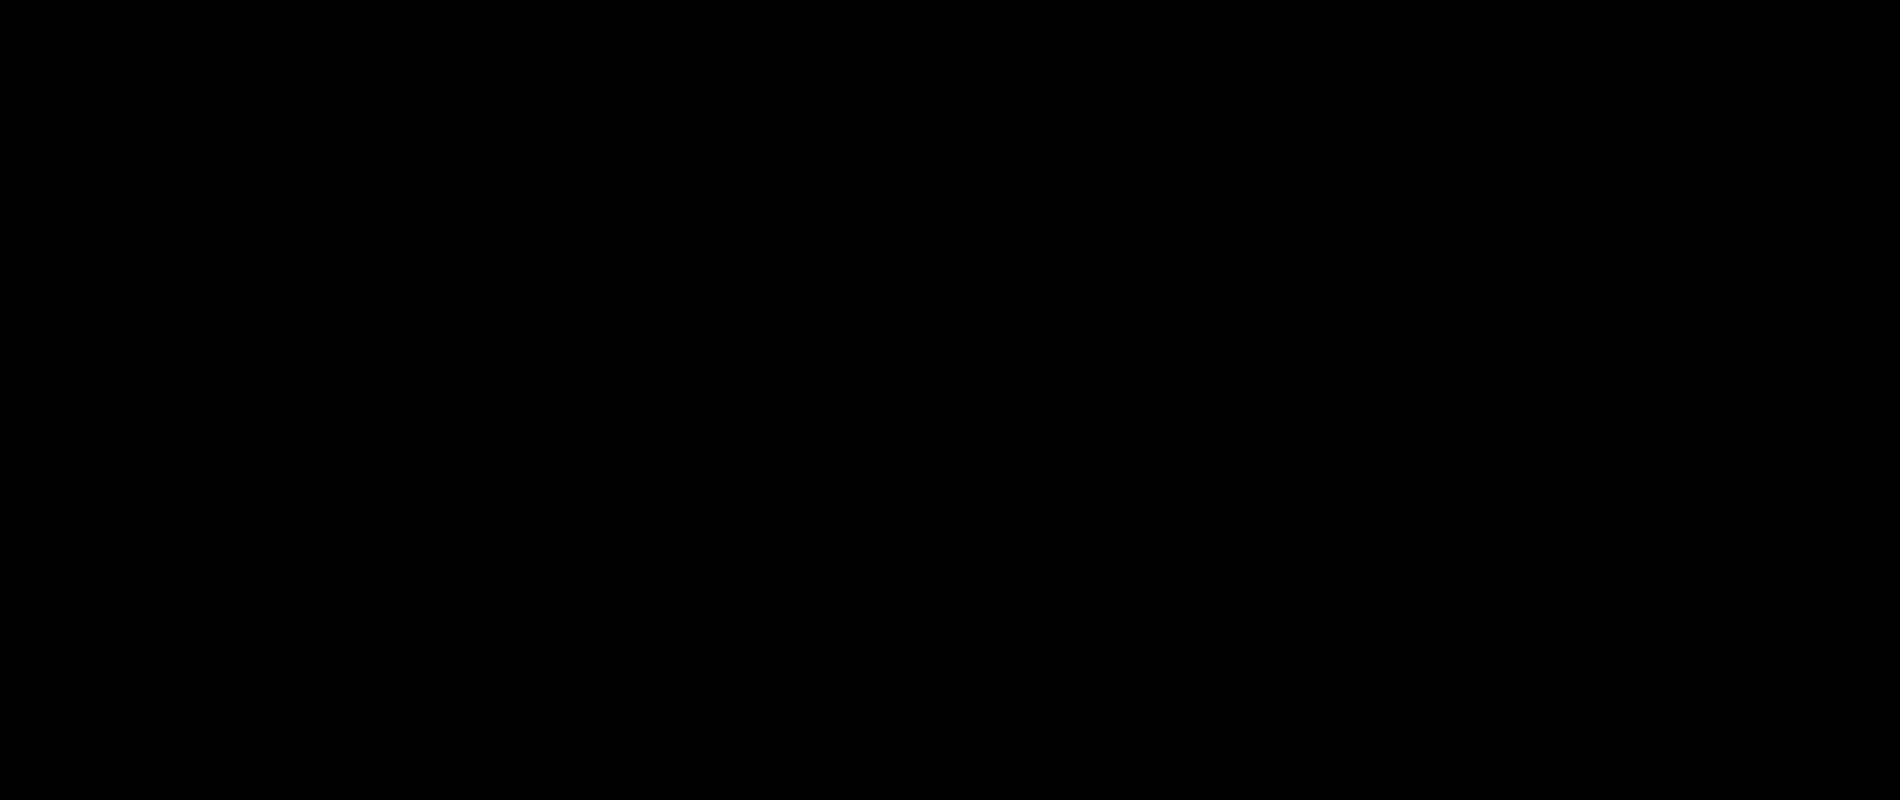 Phasellus viverra